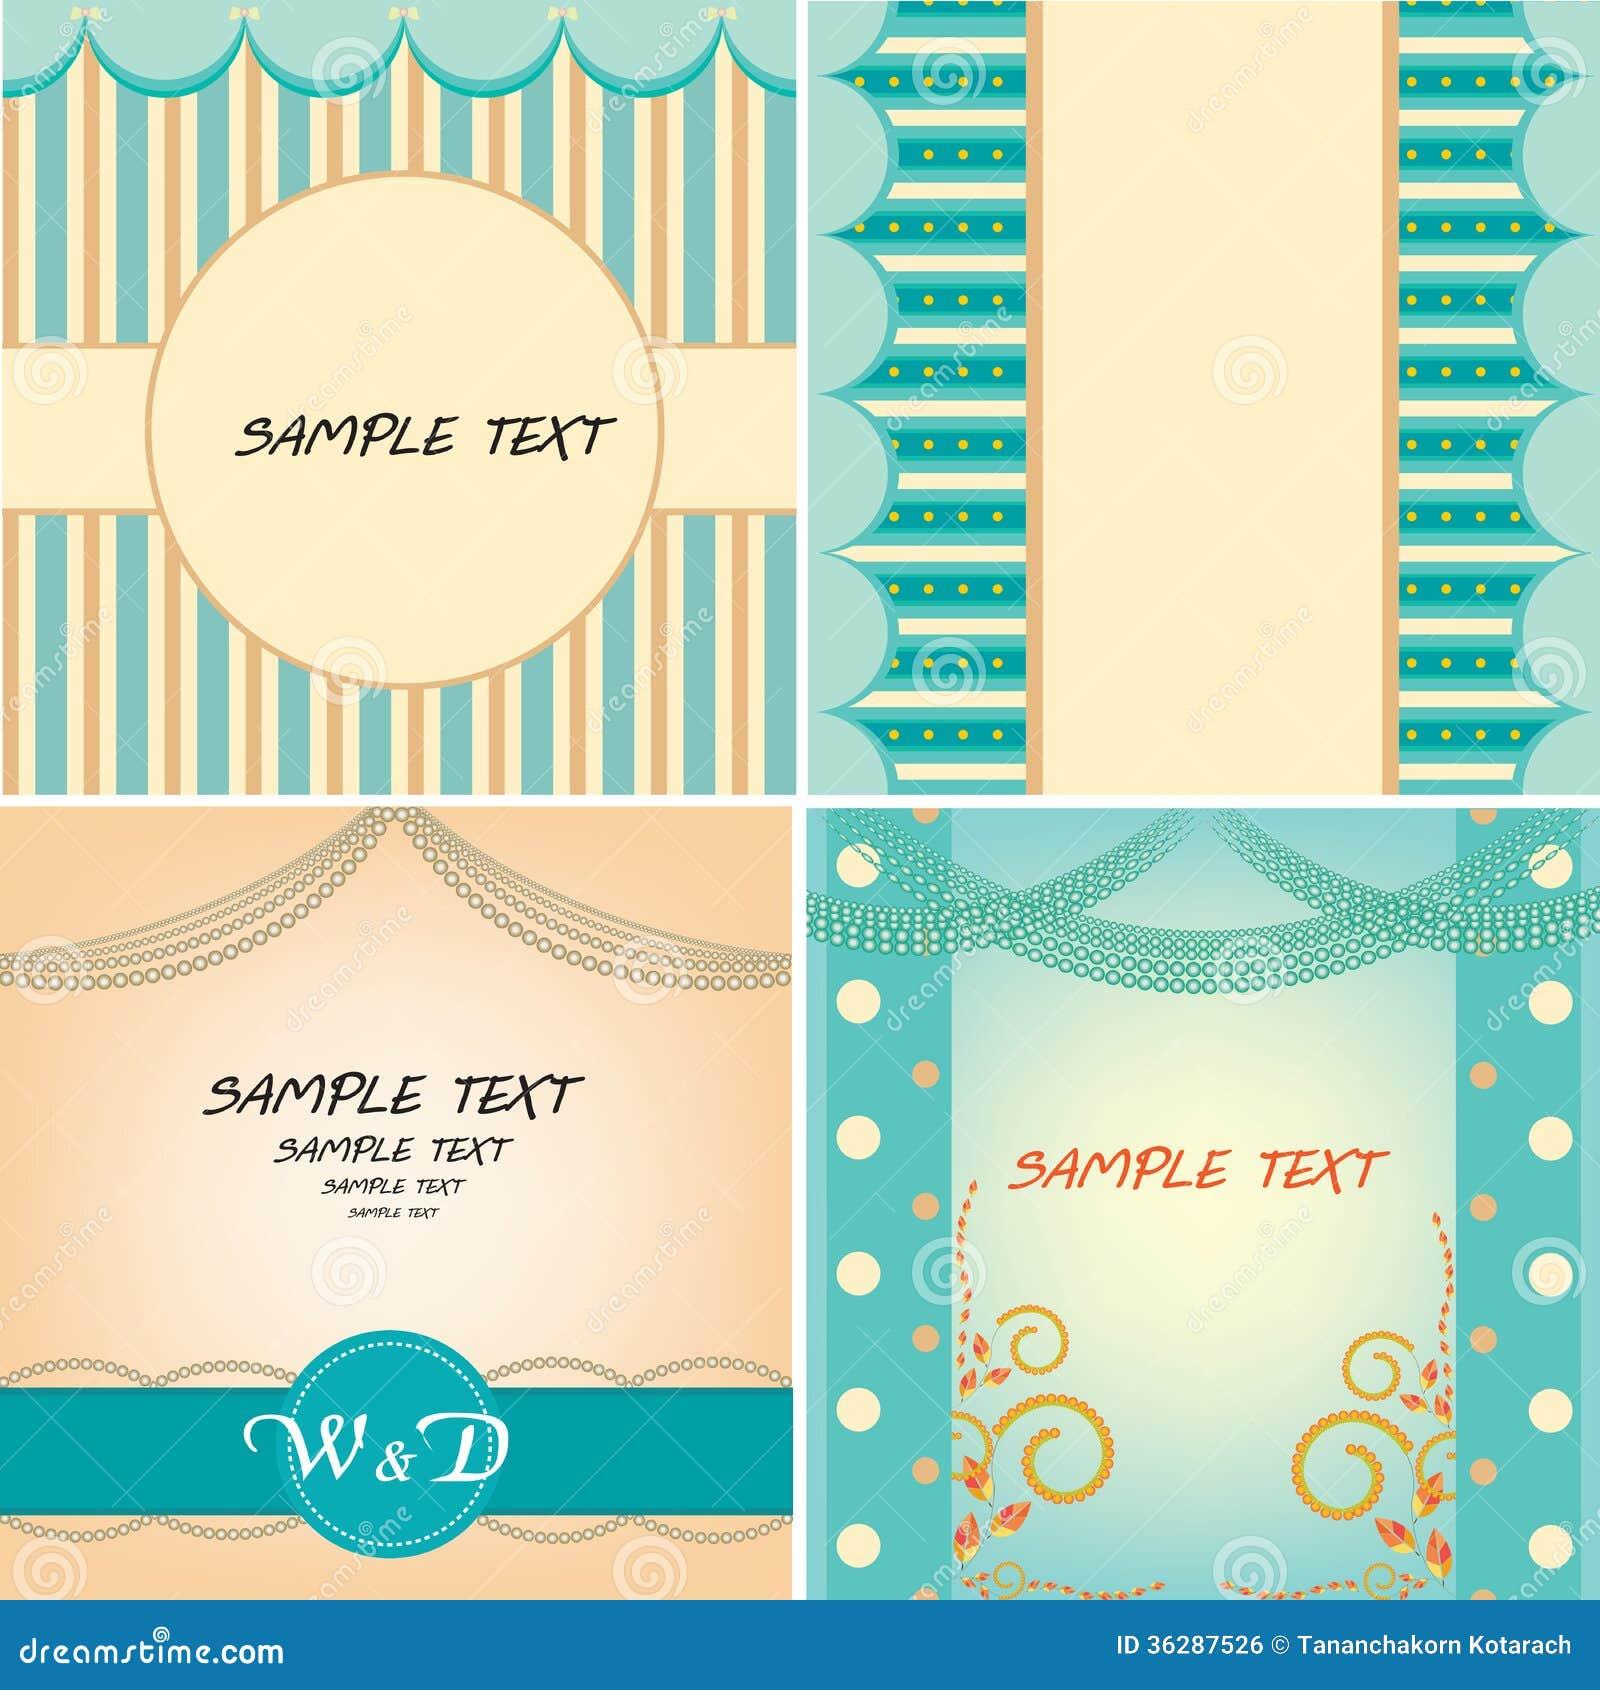 sweet sixteen program template - sweet blue template royalty free stock image image 36287526